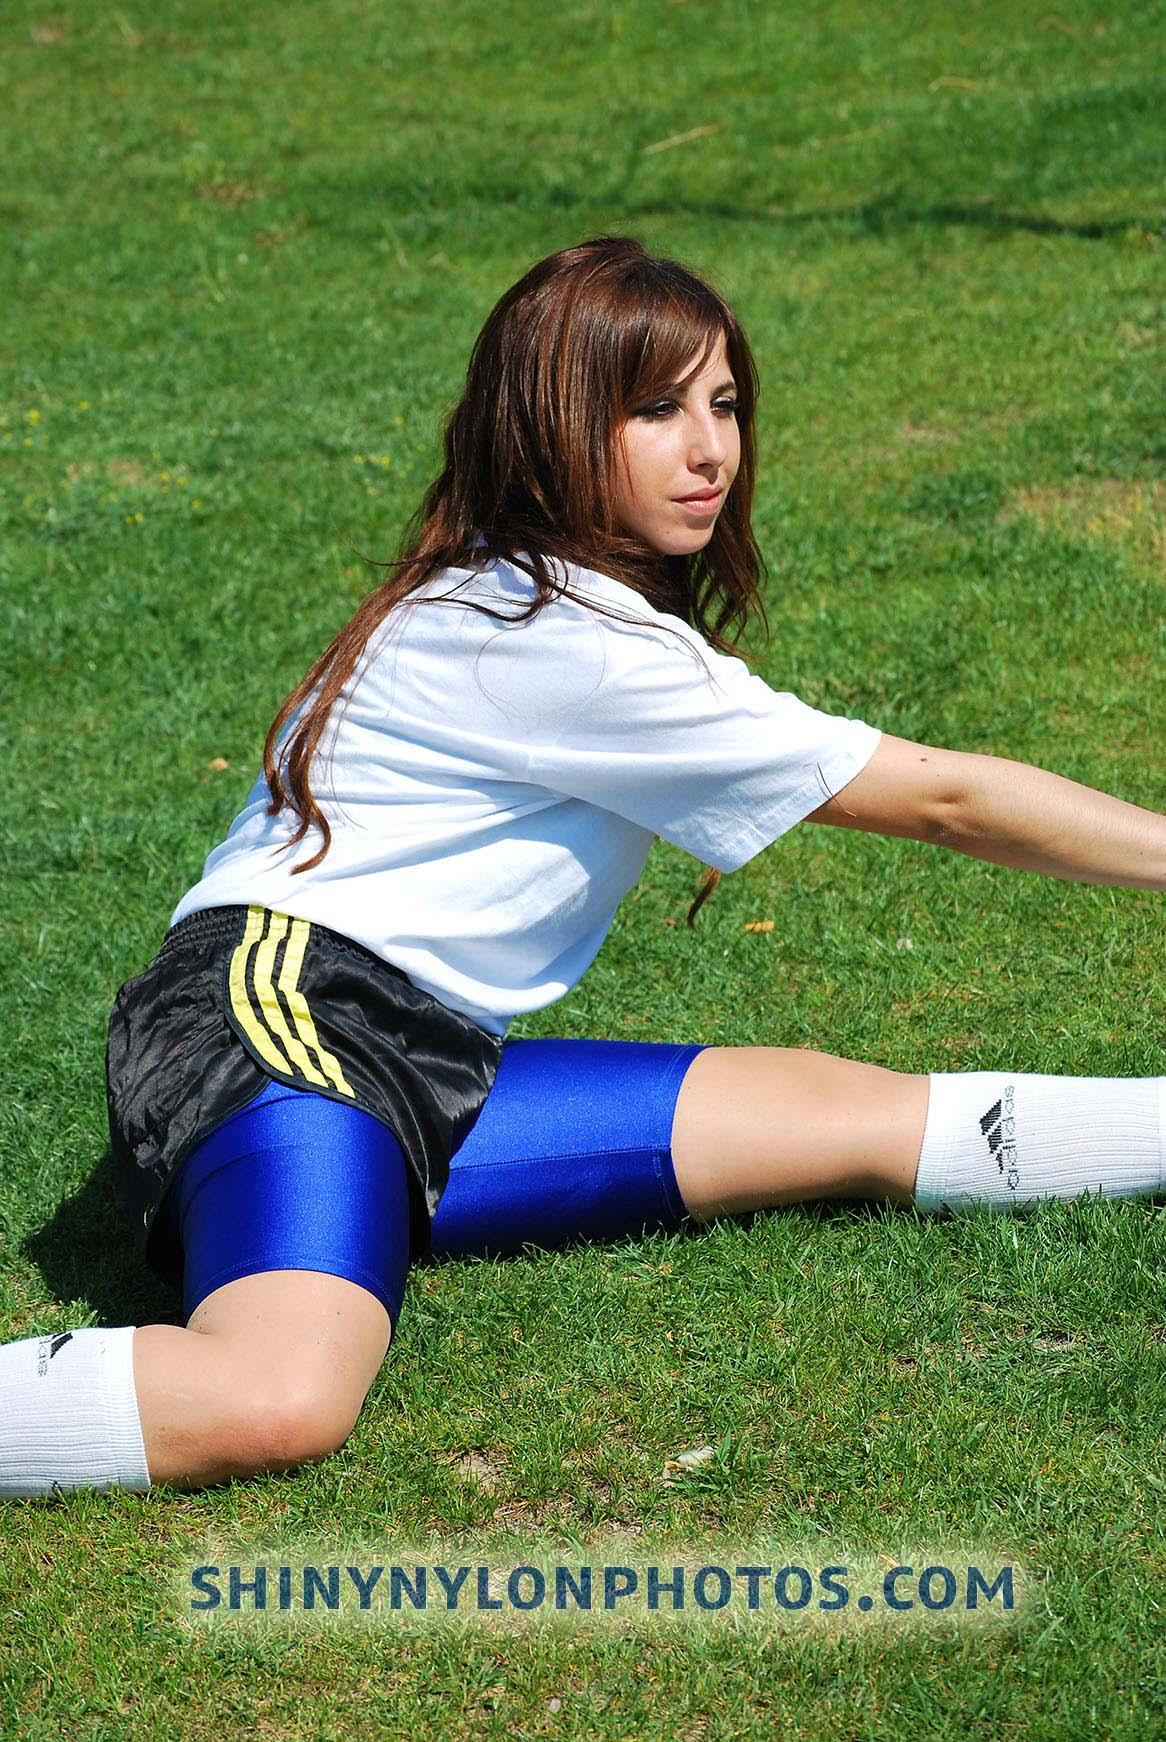 PHOTOSET 16 | Black adidas nylon shorts and blue lycra/spandex shorts